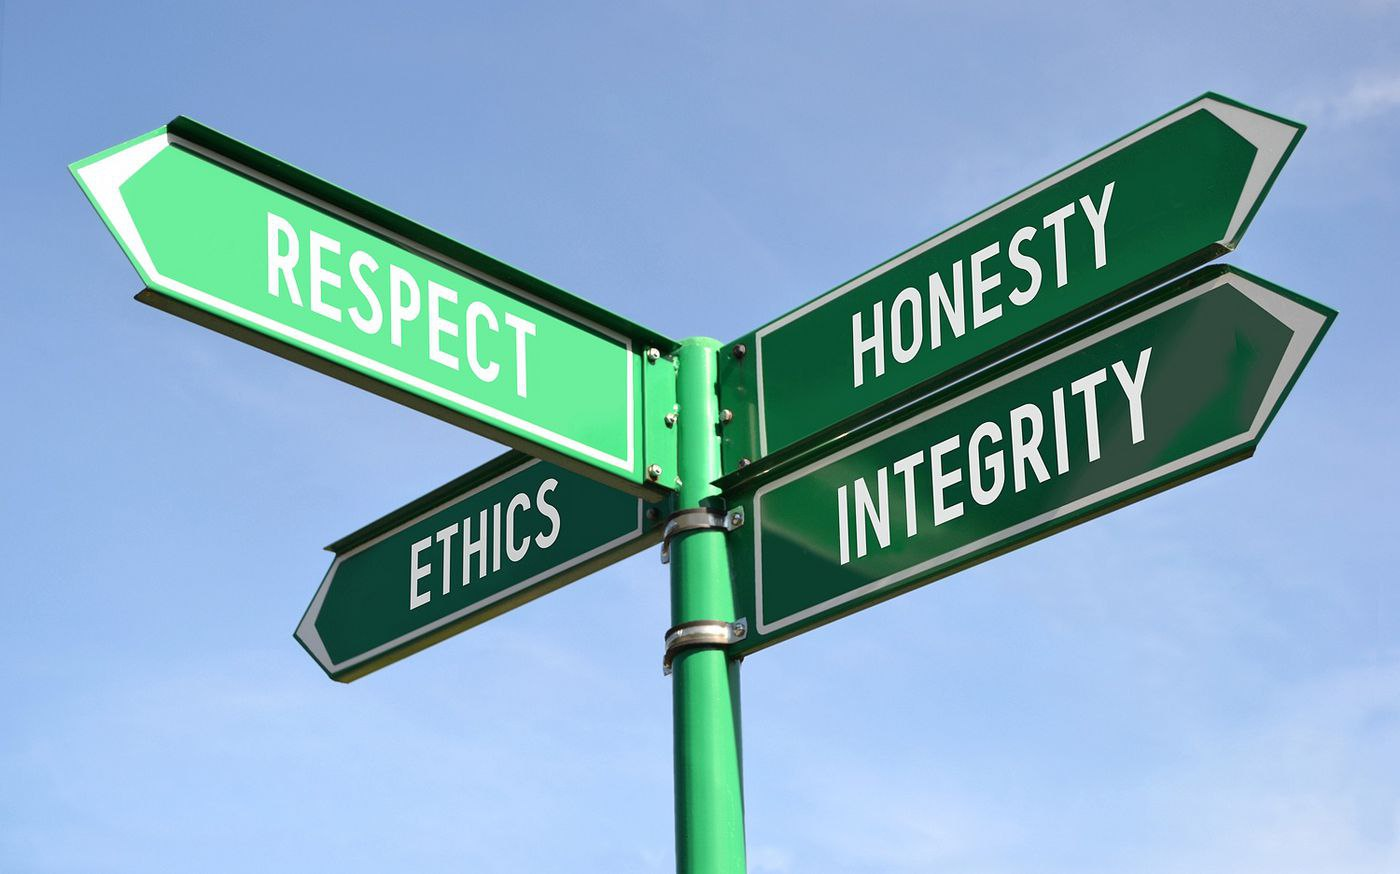 Reflections on Leadership | Faith and Integrity